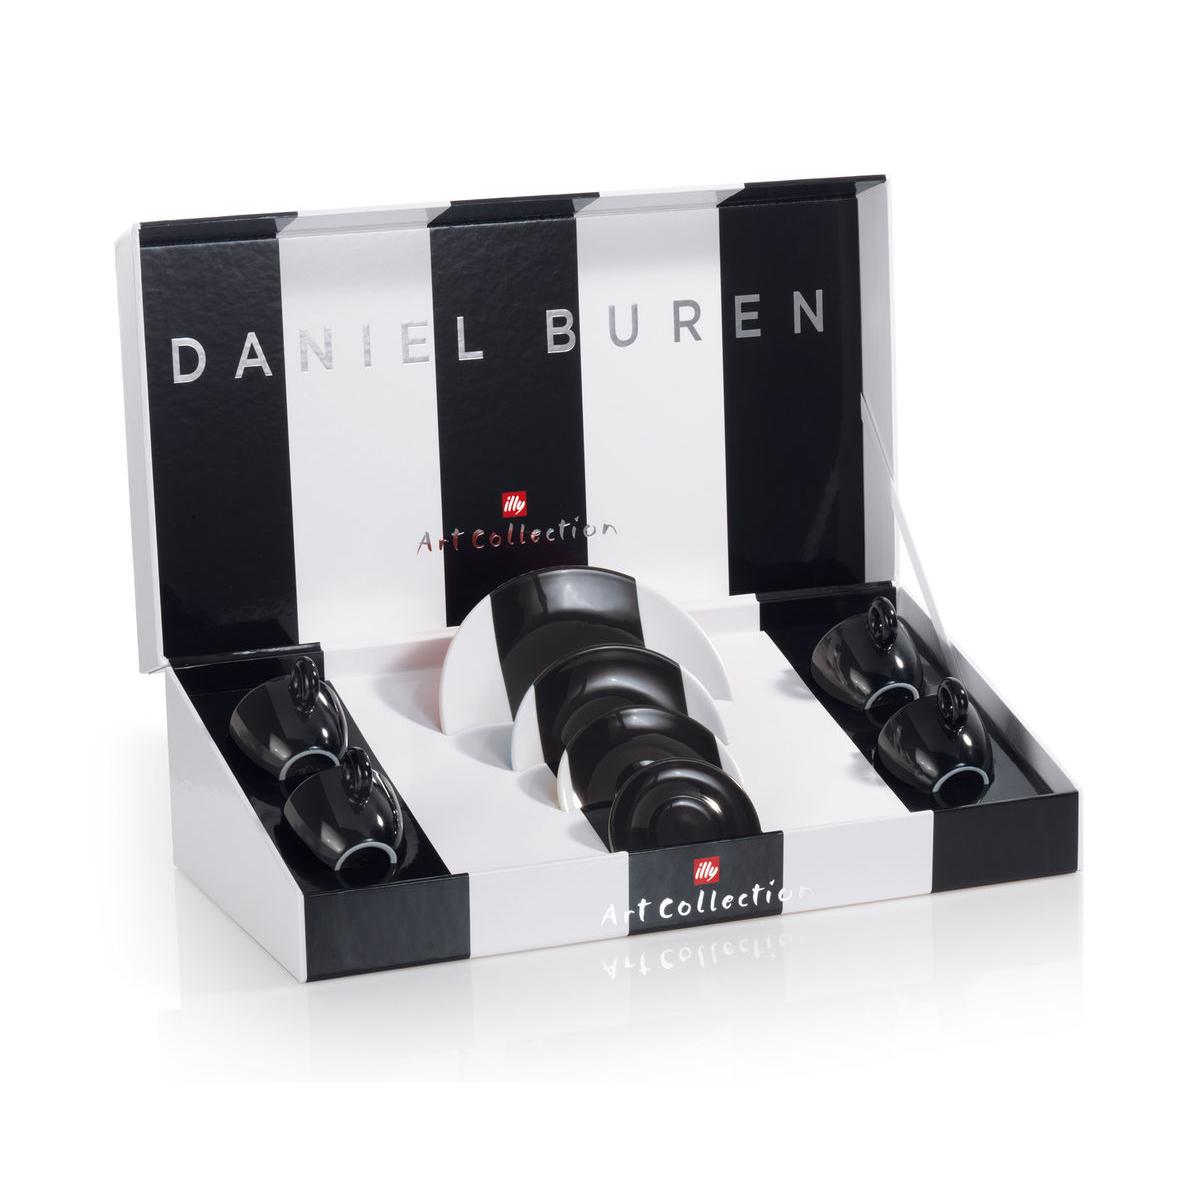 Illy Daniel Buren Espresso Cups (box/4pcs)